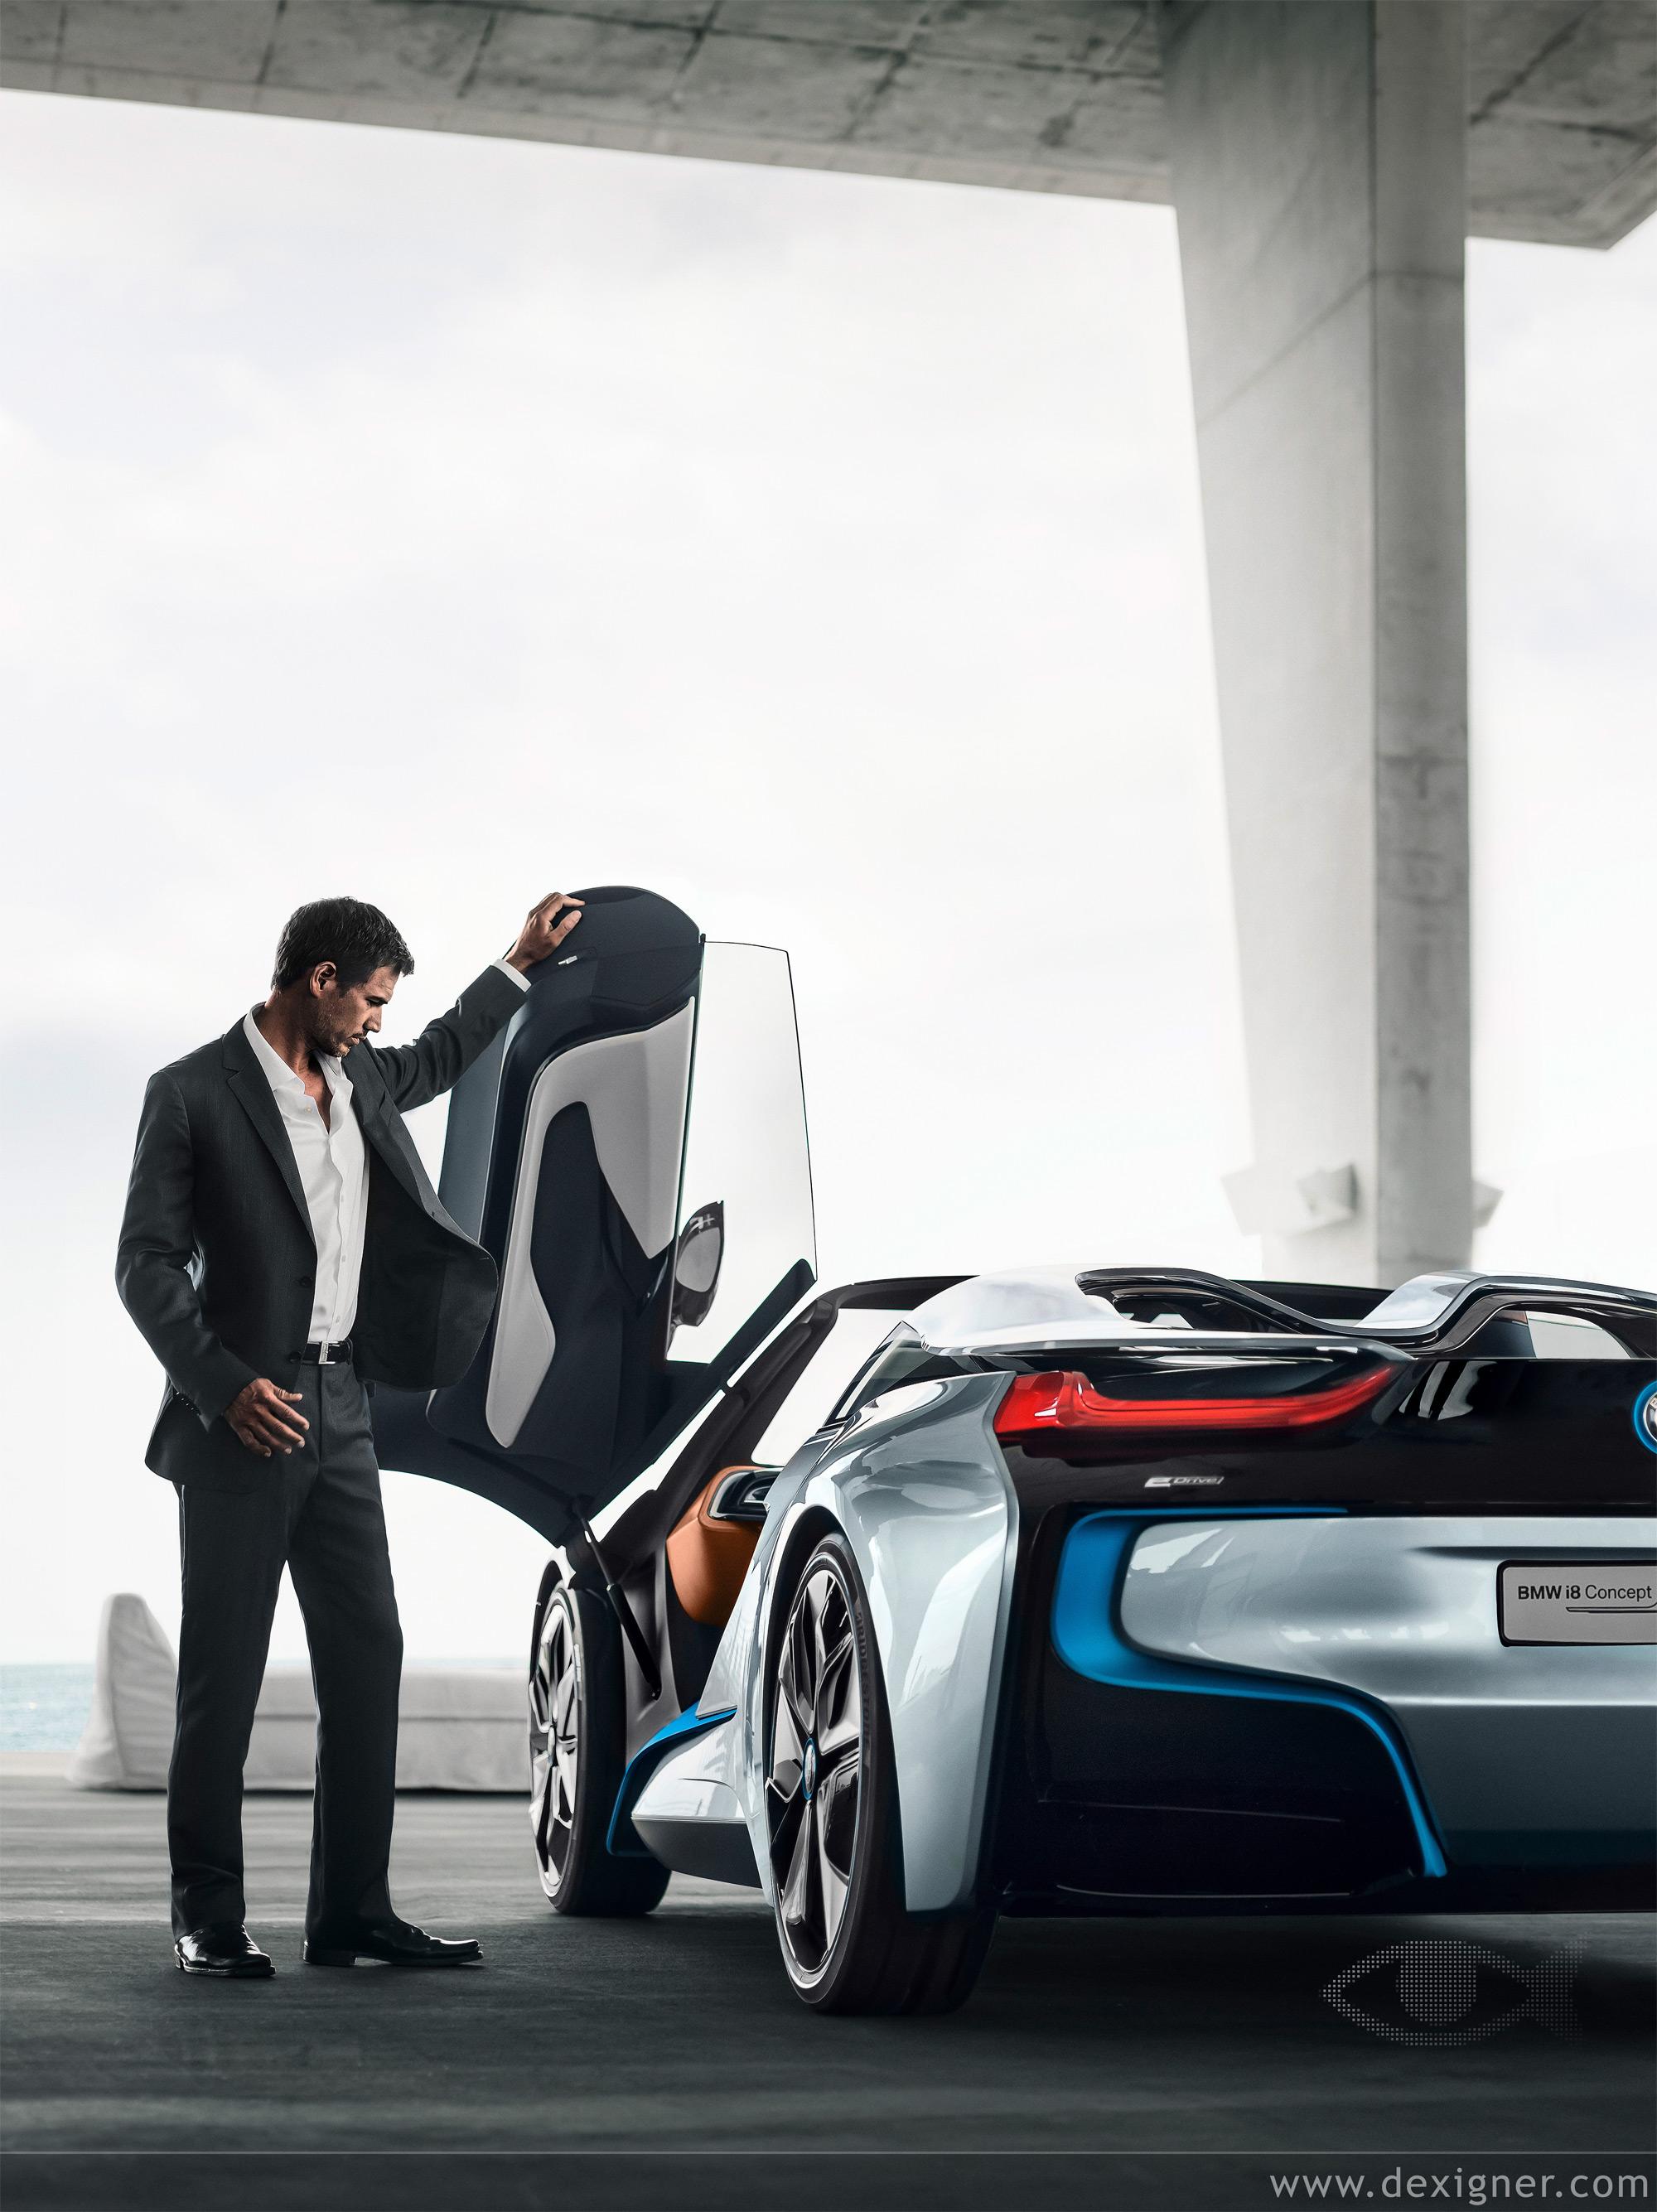 BMW_i8_Concept_Spyder_07.jpg (5484×7320)